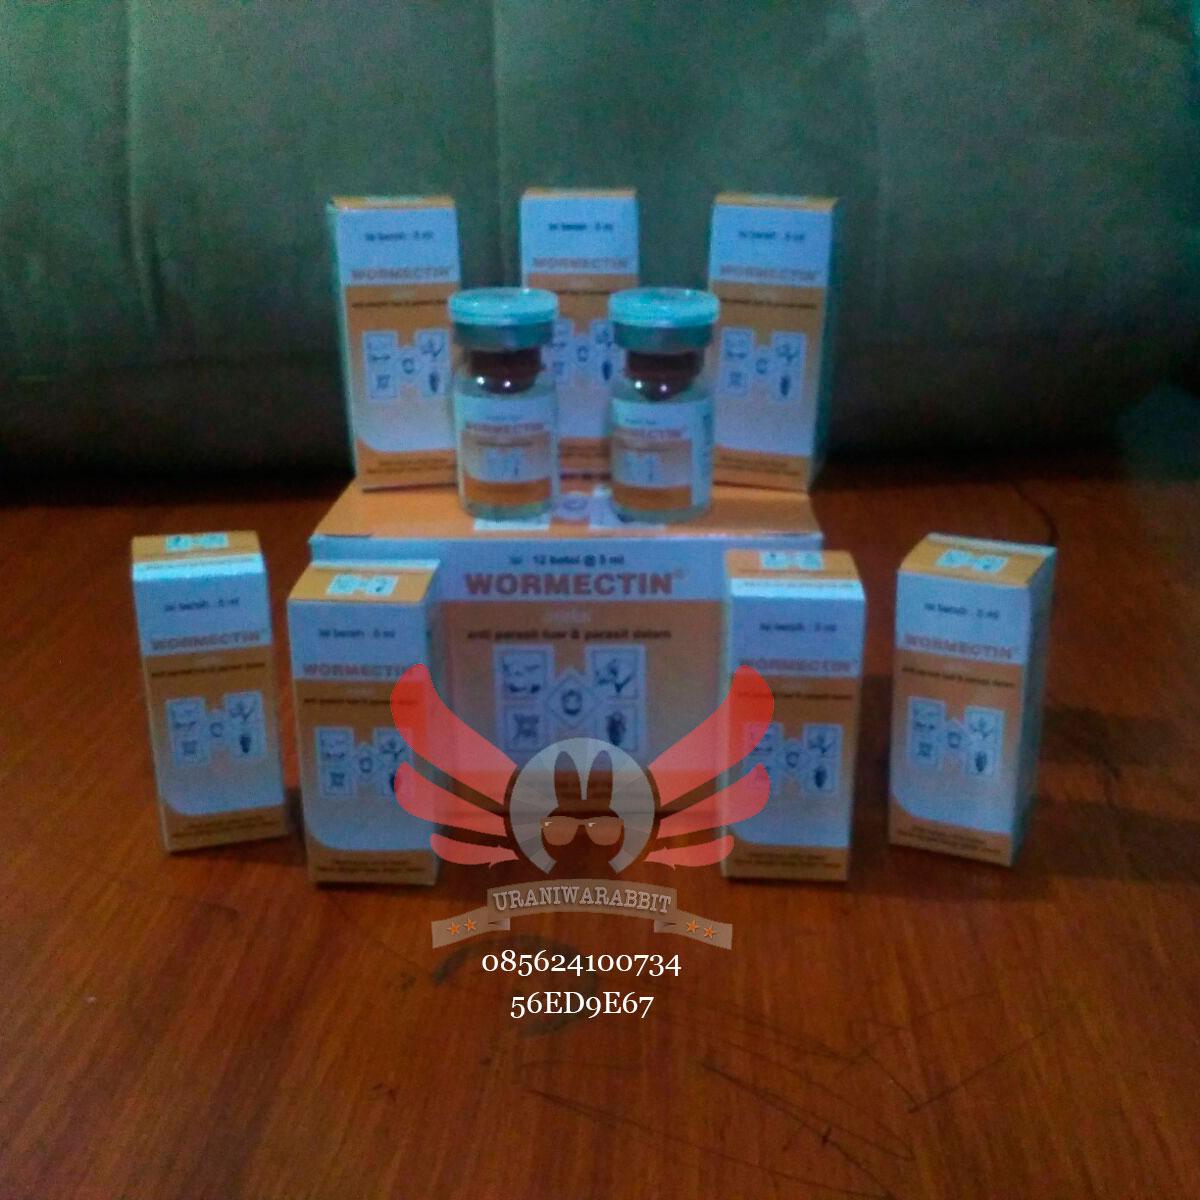 Obat Scabies Injeksi - Wormectin 2ml